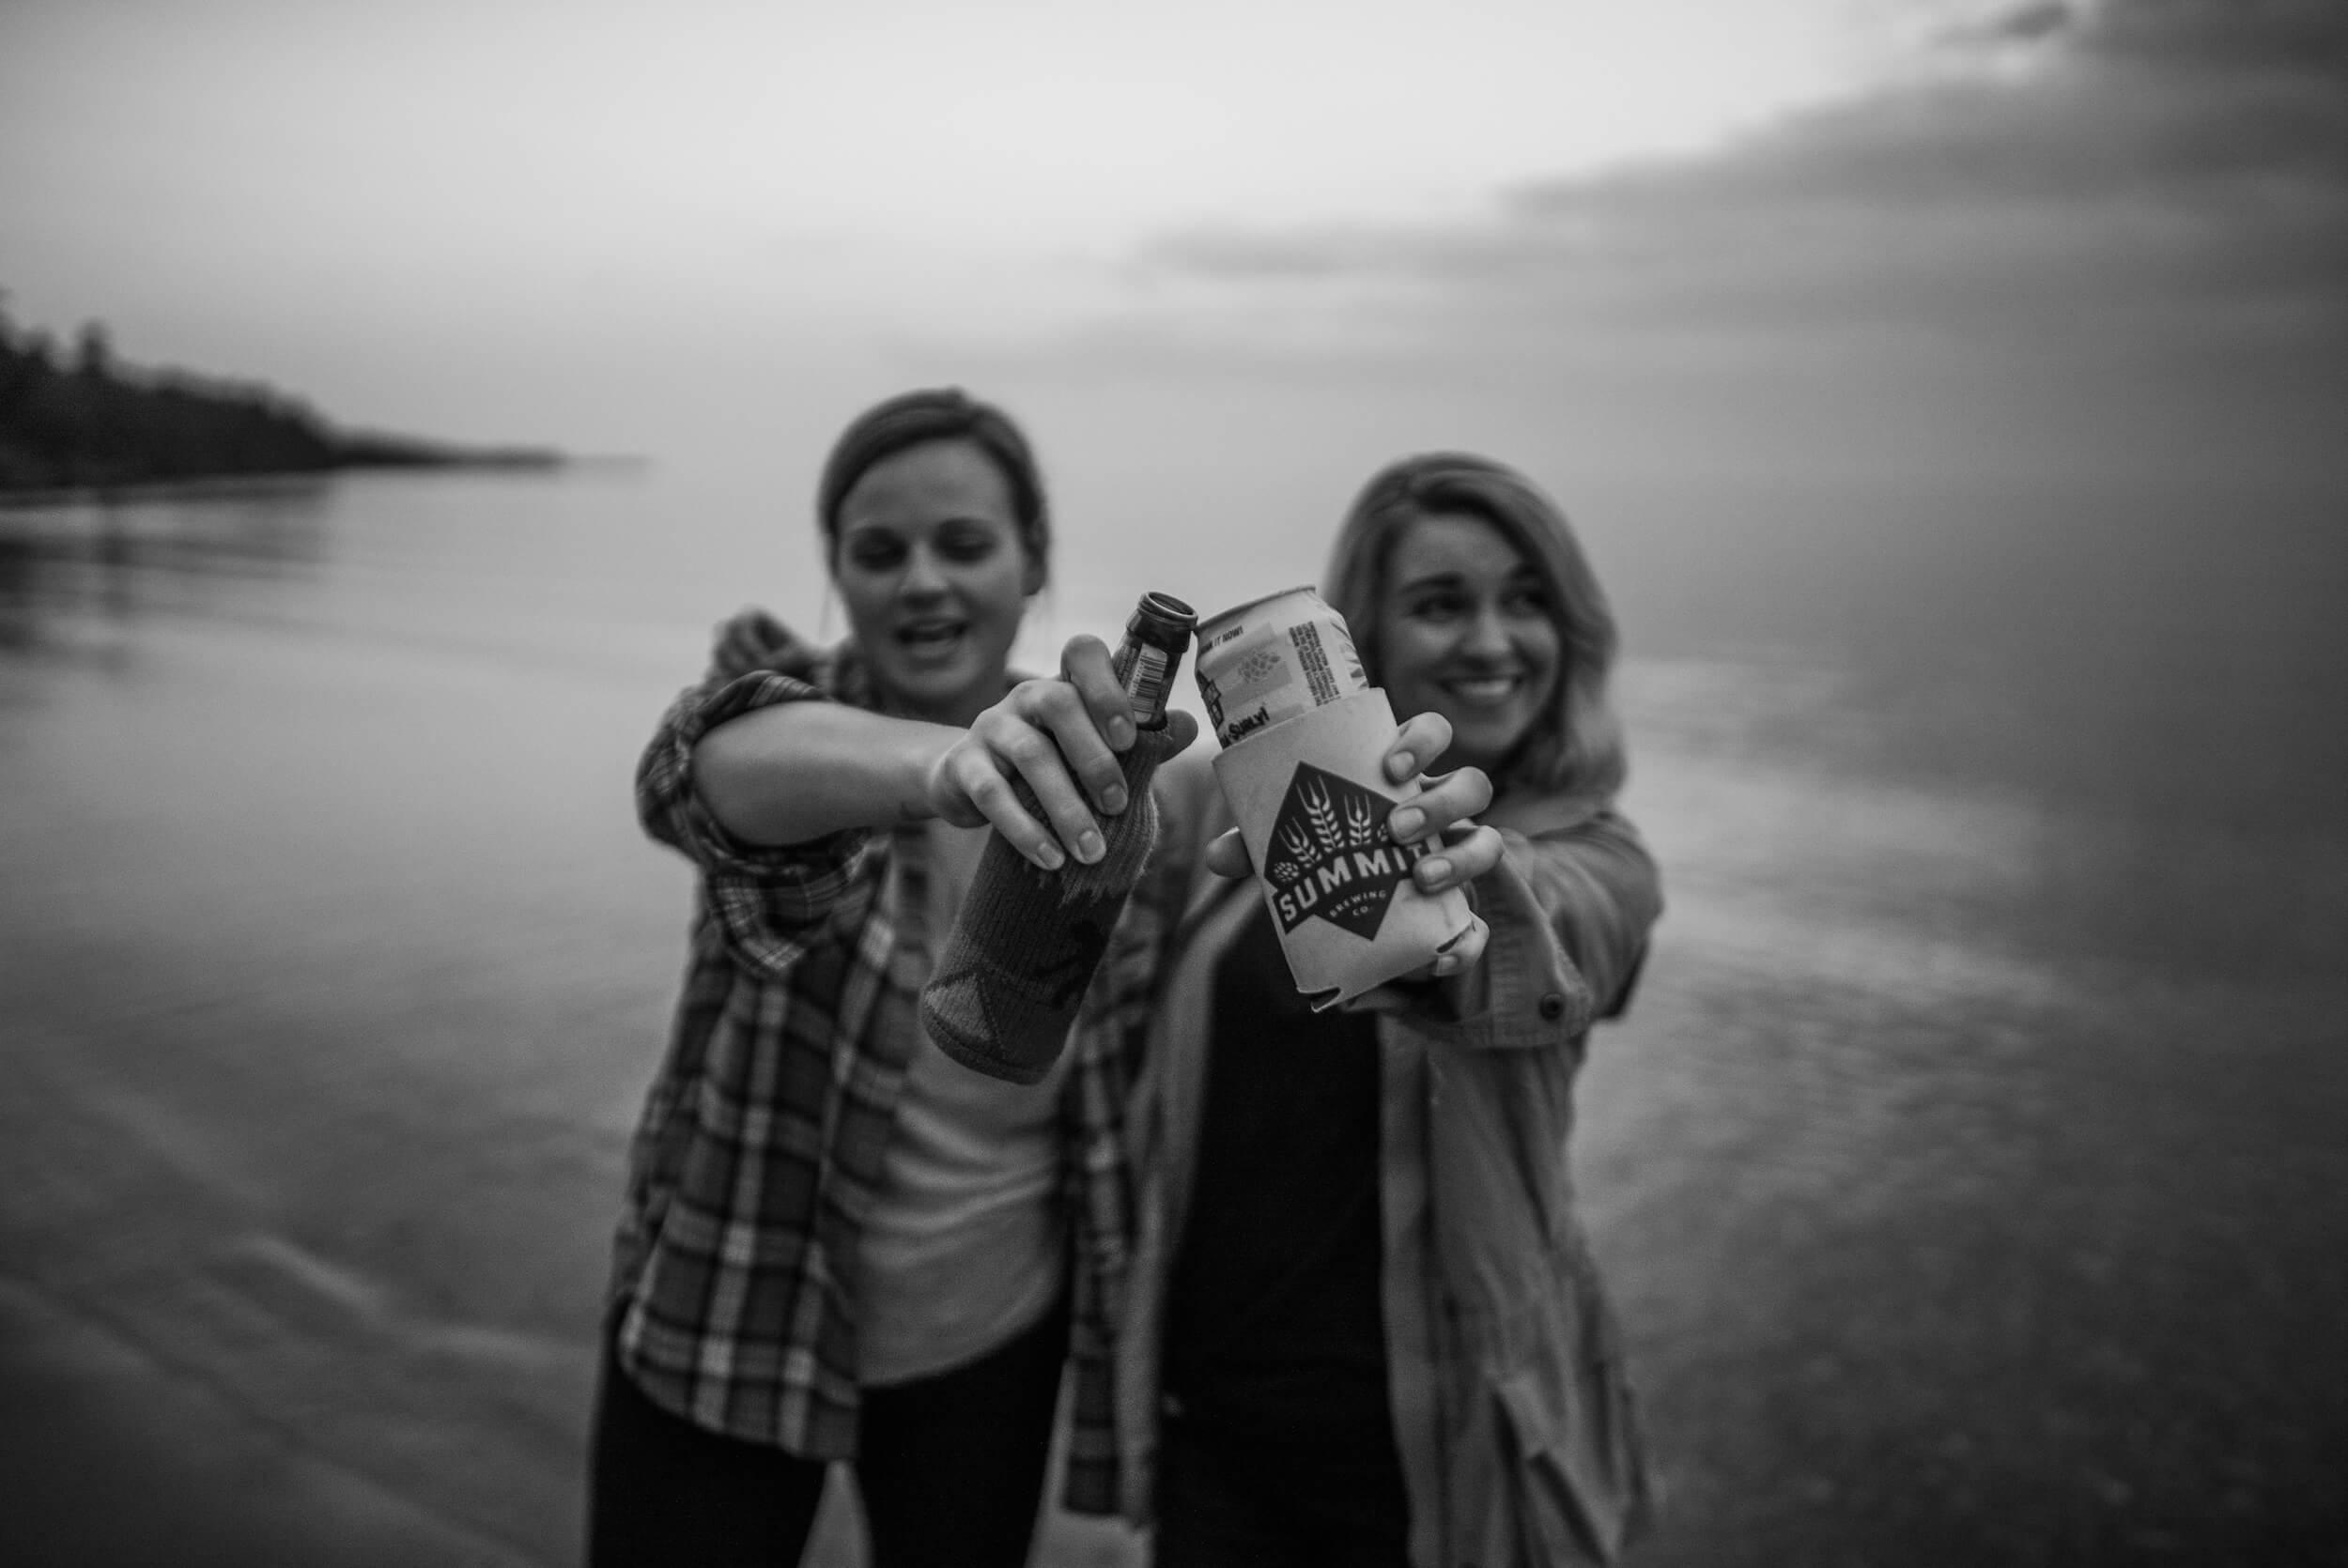 engle-olson-photography-madeline-island-6.jpg